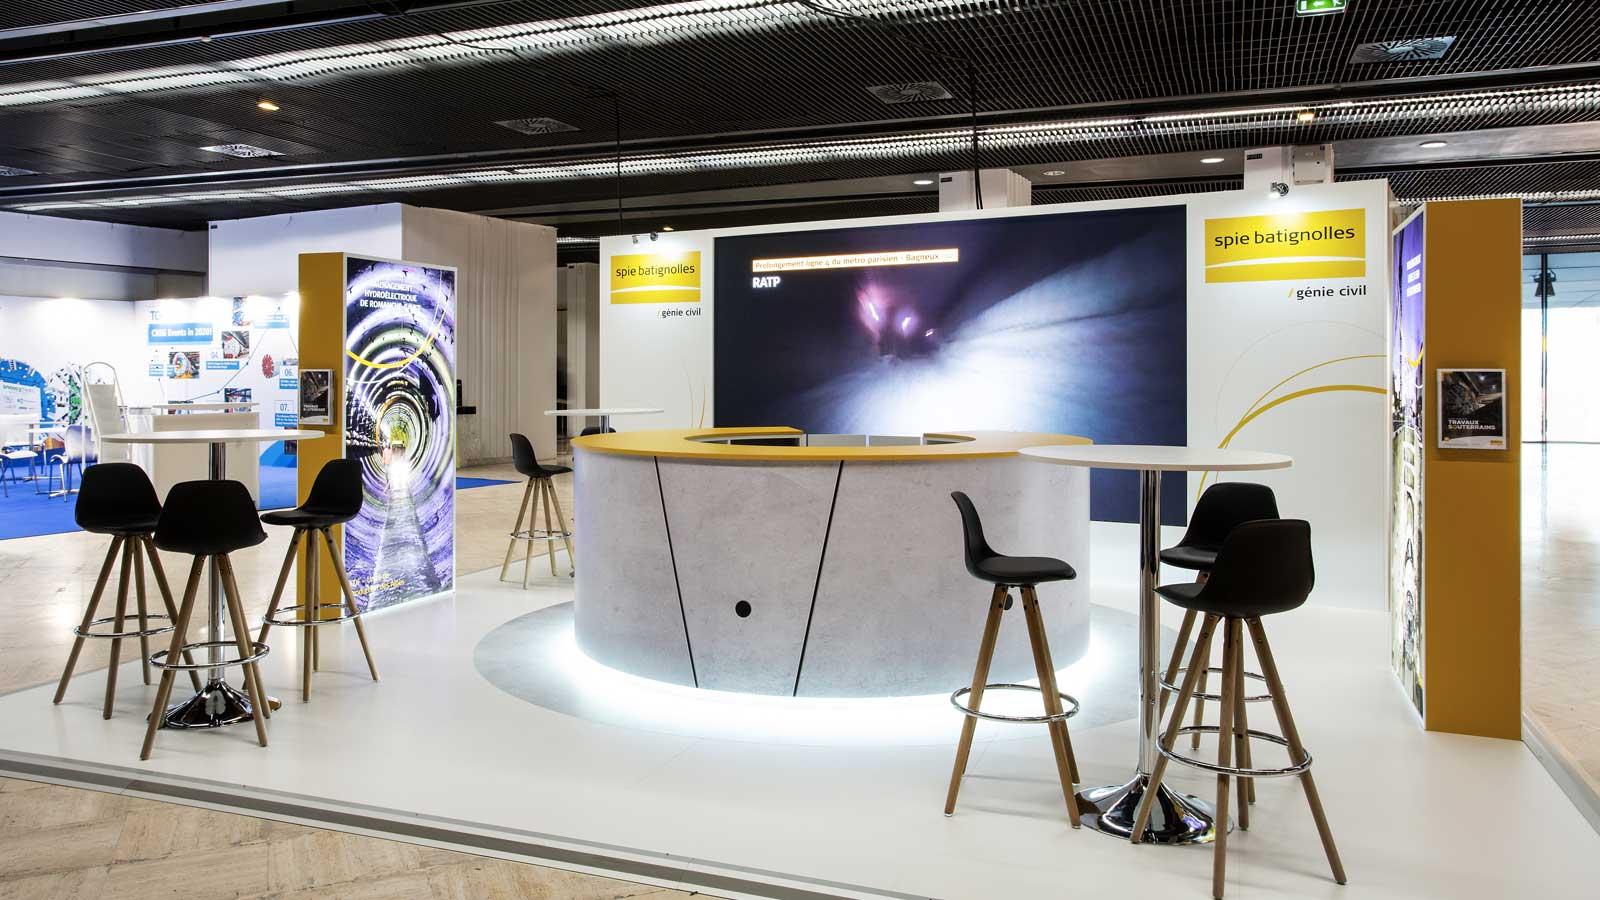 Stand-Design-Spie-Batignolles-AFTES-EcranLED